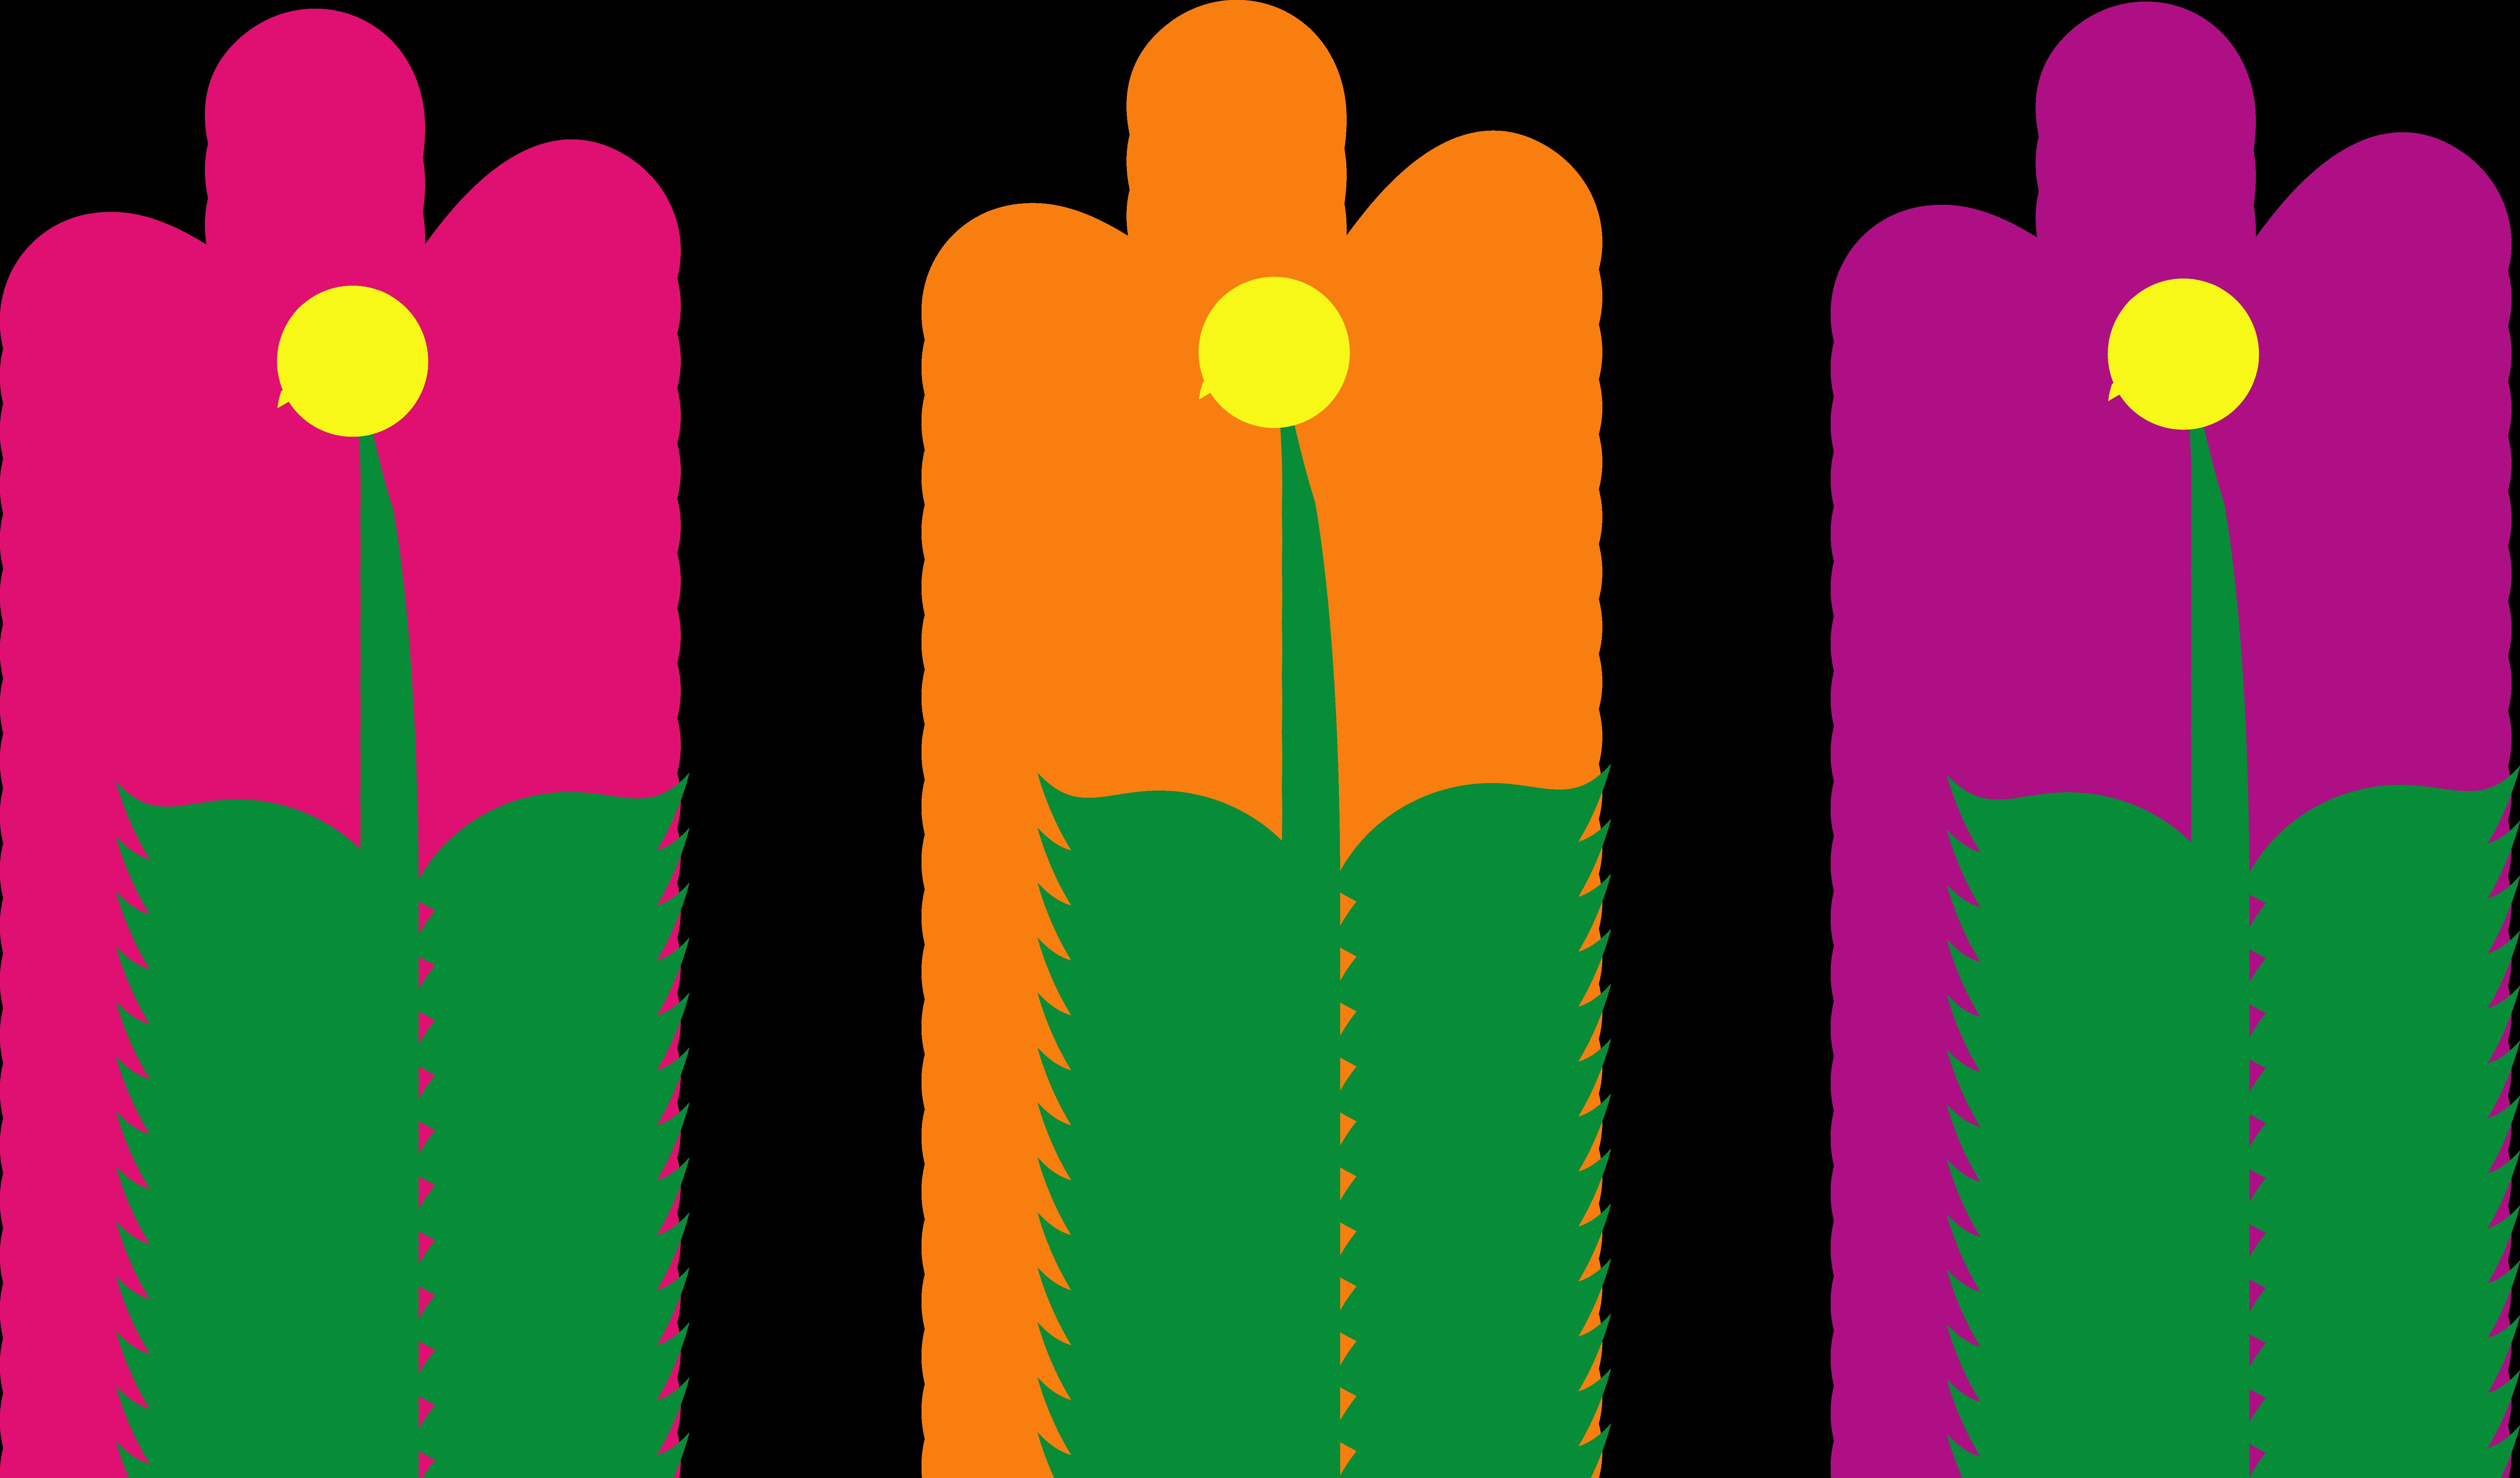 Flower Cartoon Clipart - Cliparts.co